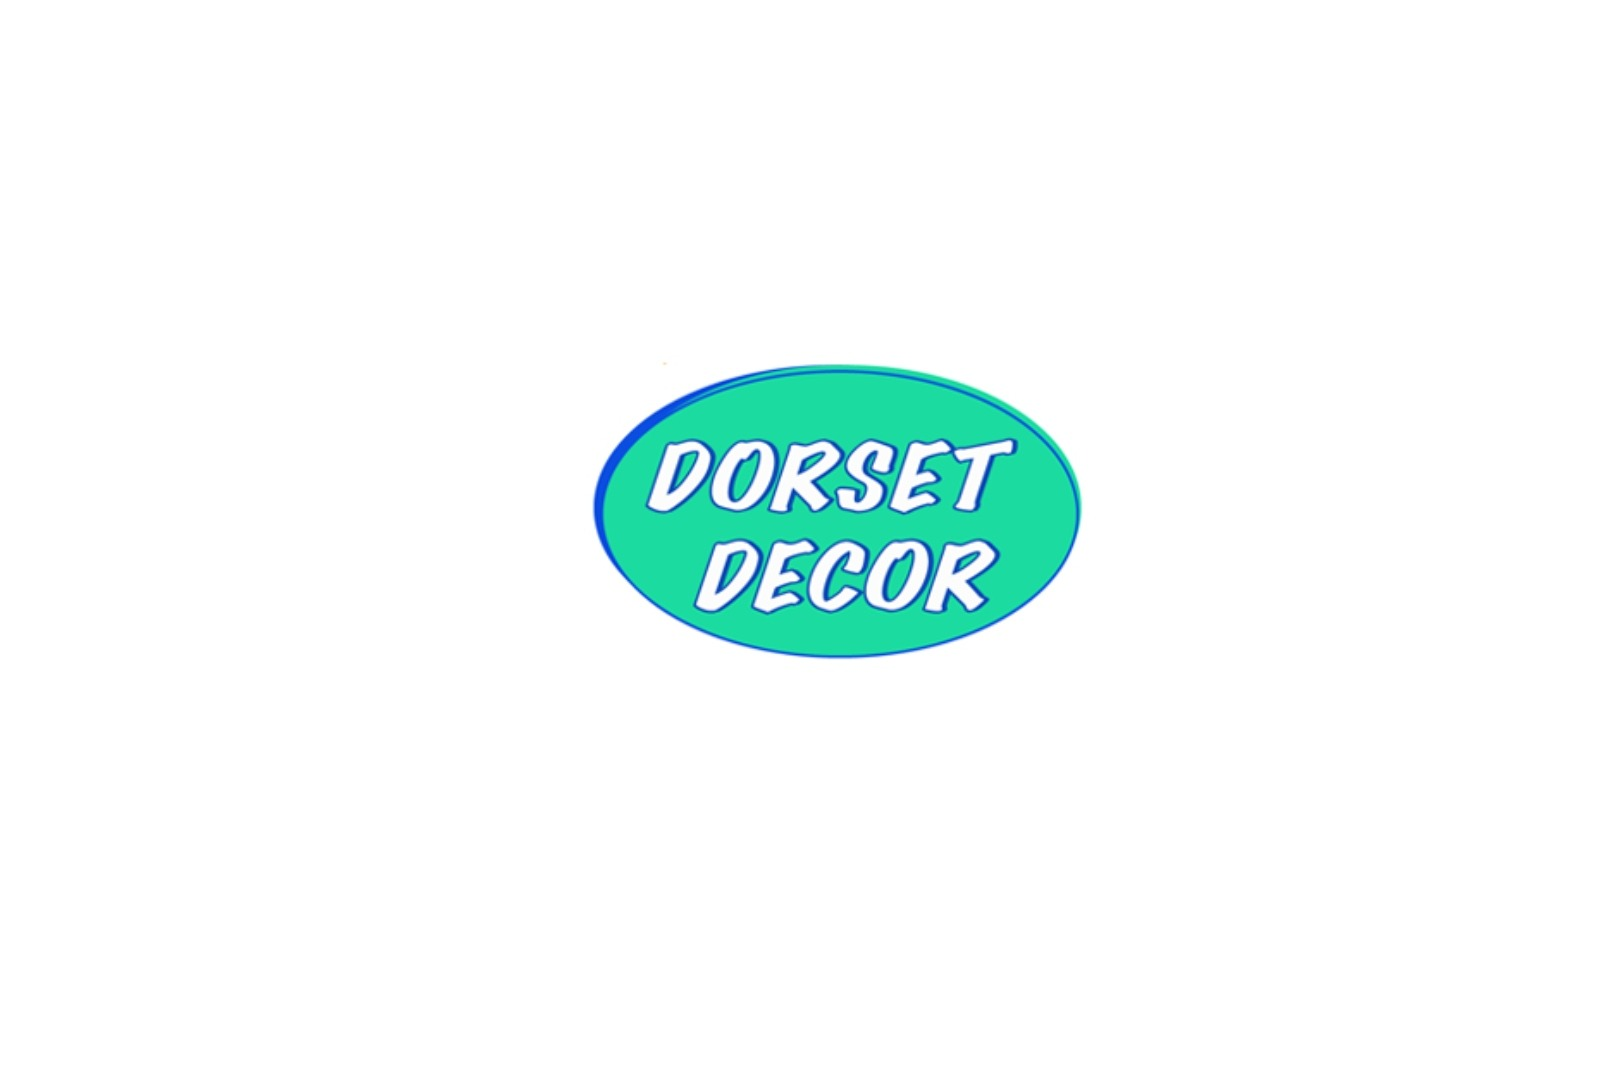 https://www.ddpaintersanddecoratorsbournemouth.co.uk/contact.php